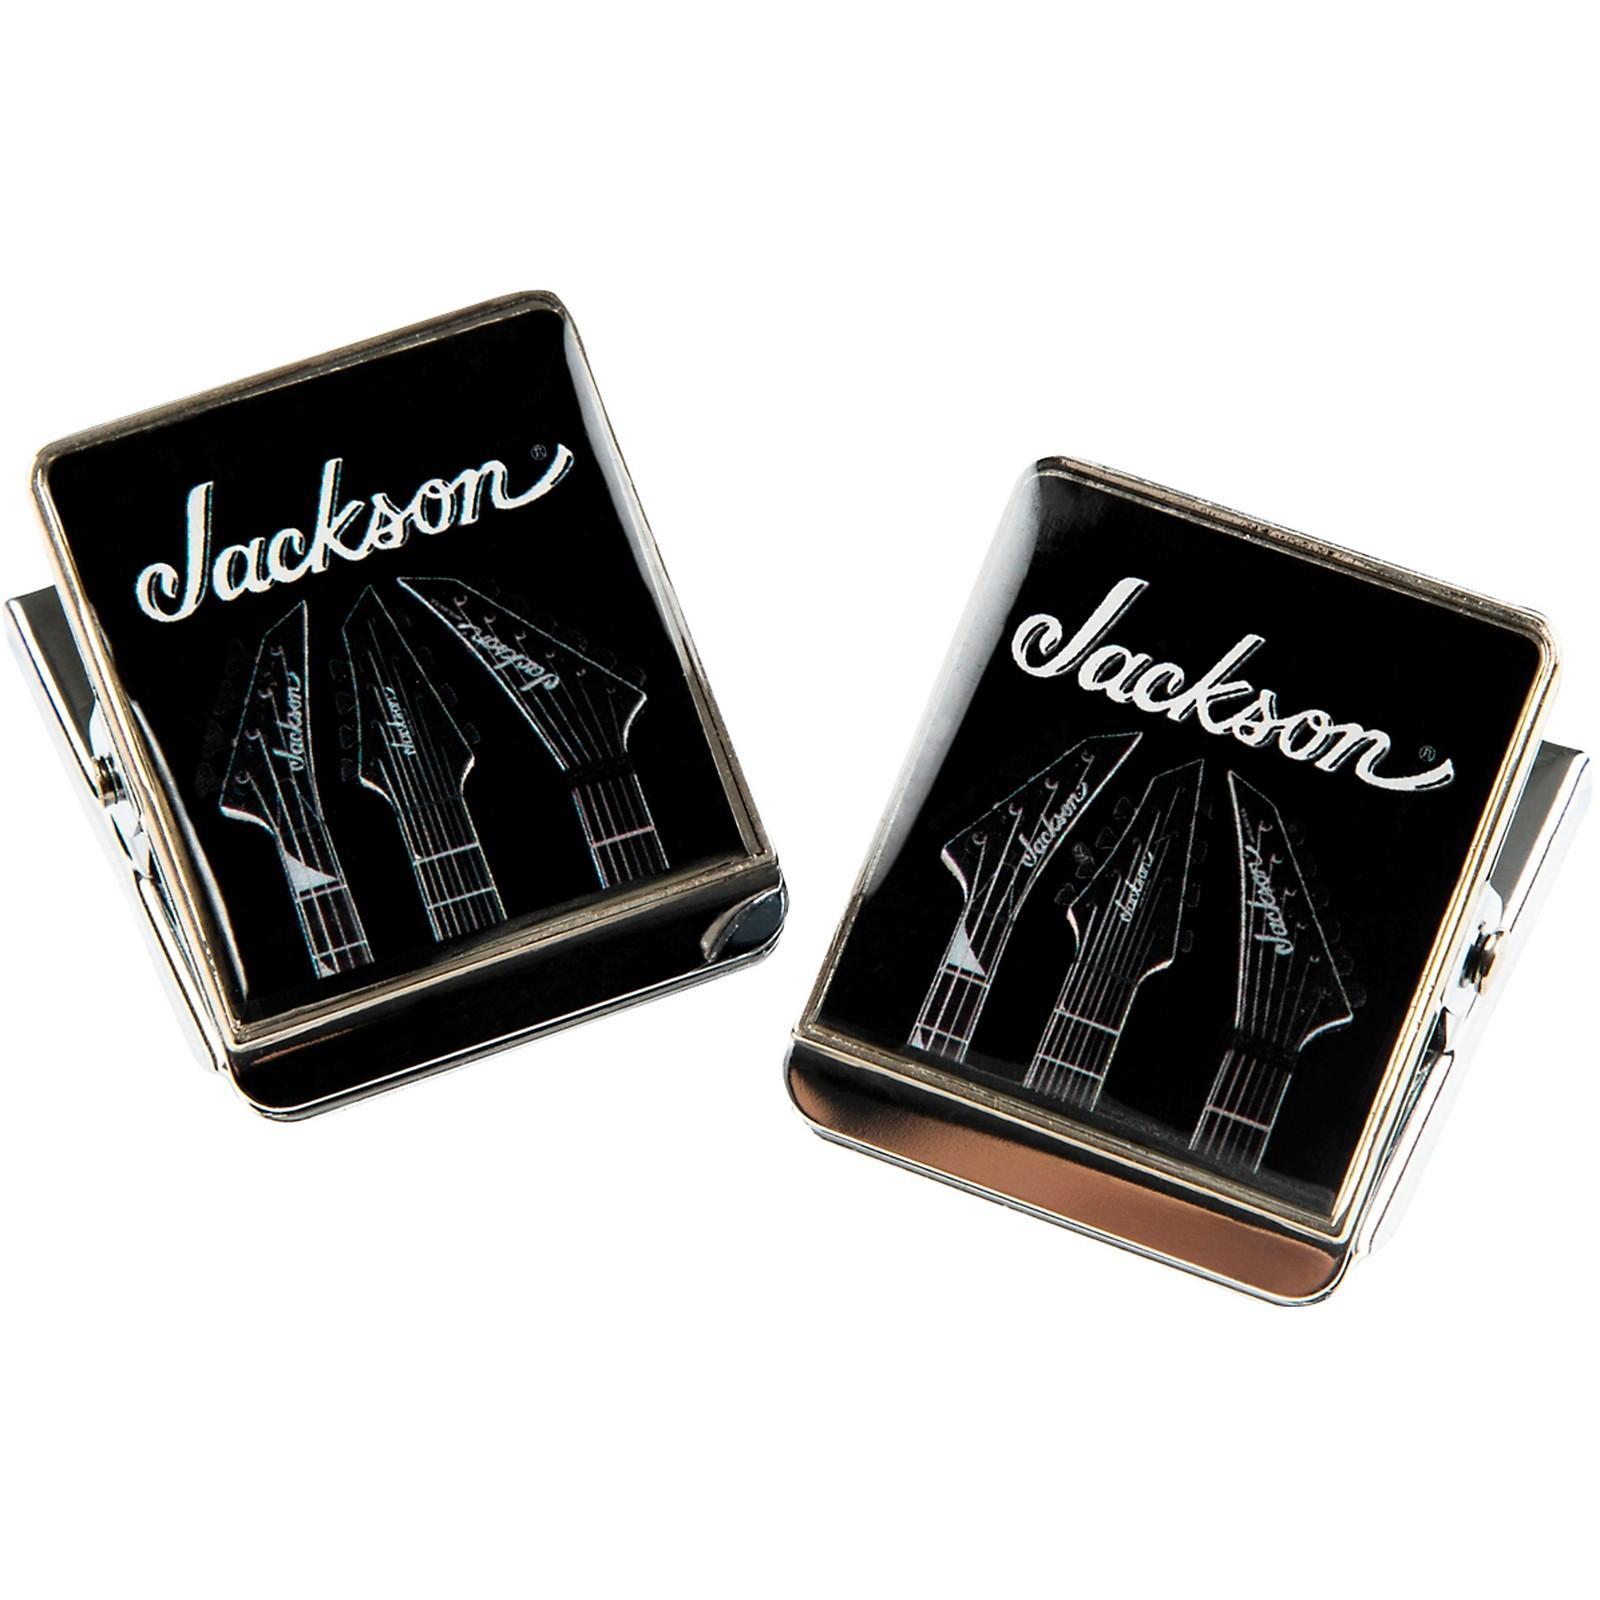 Jackson Logo Clip Magnets (Pair)